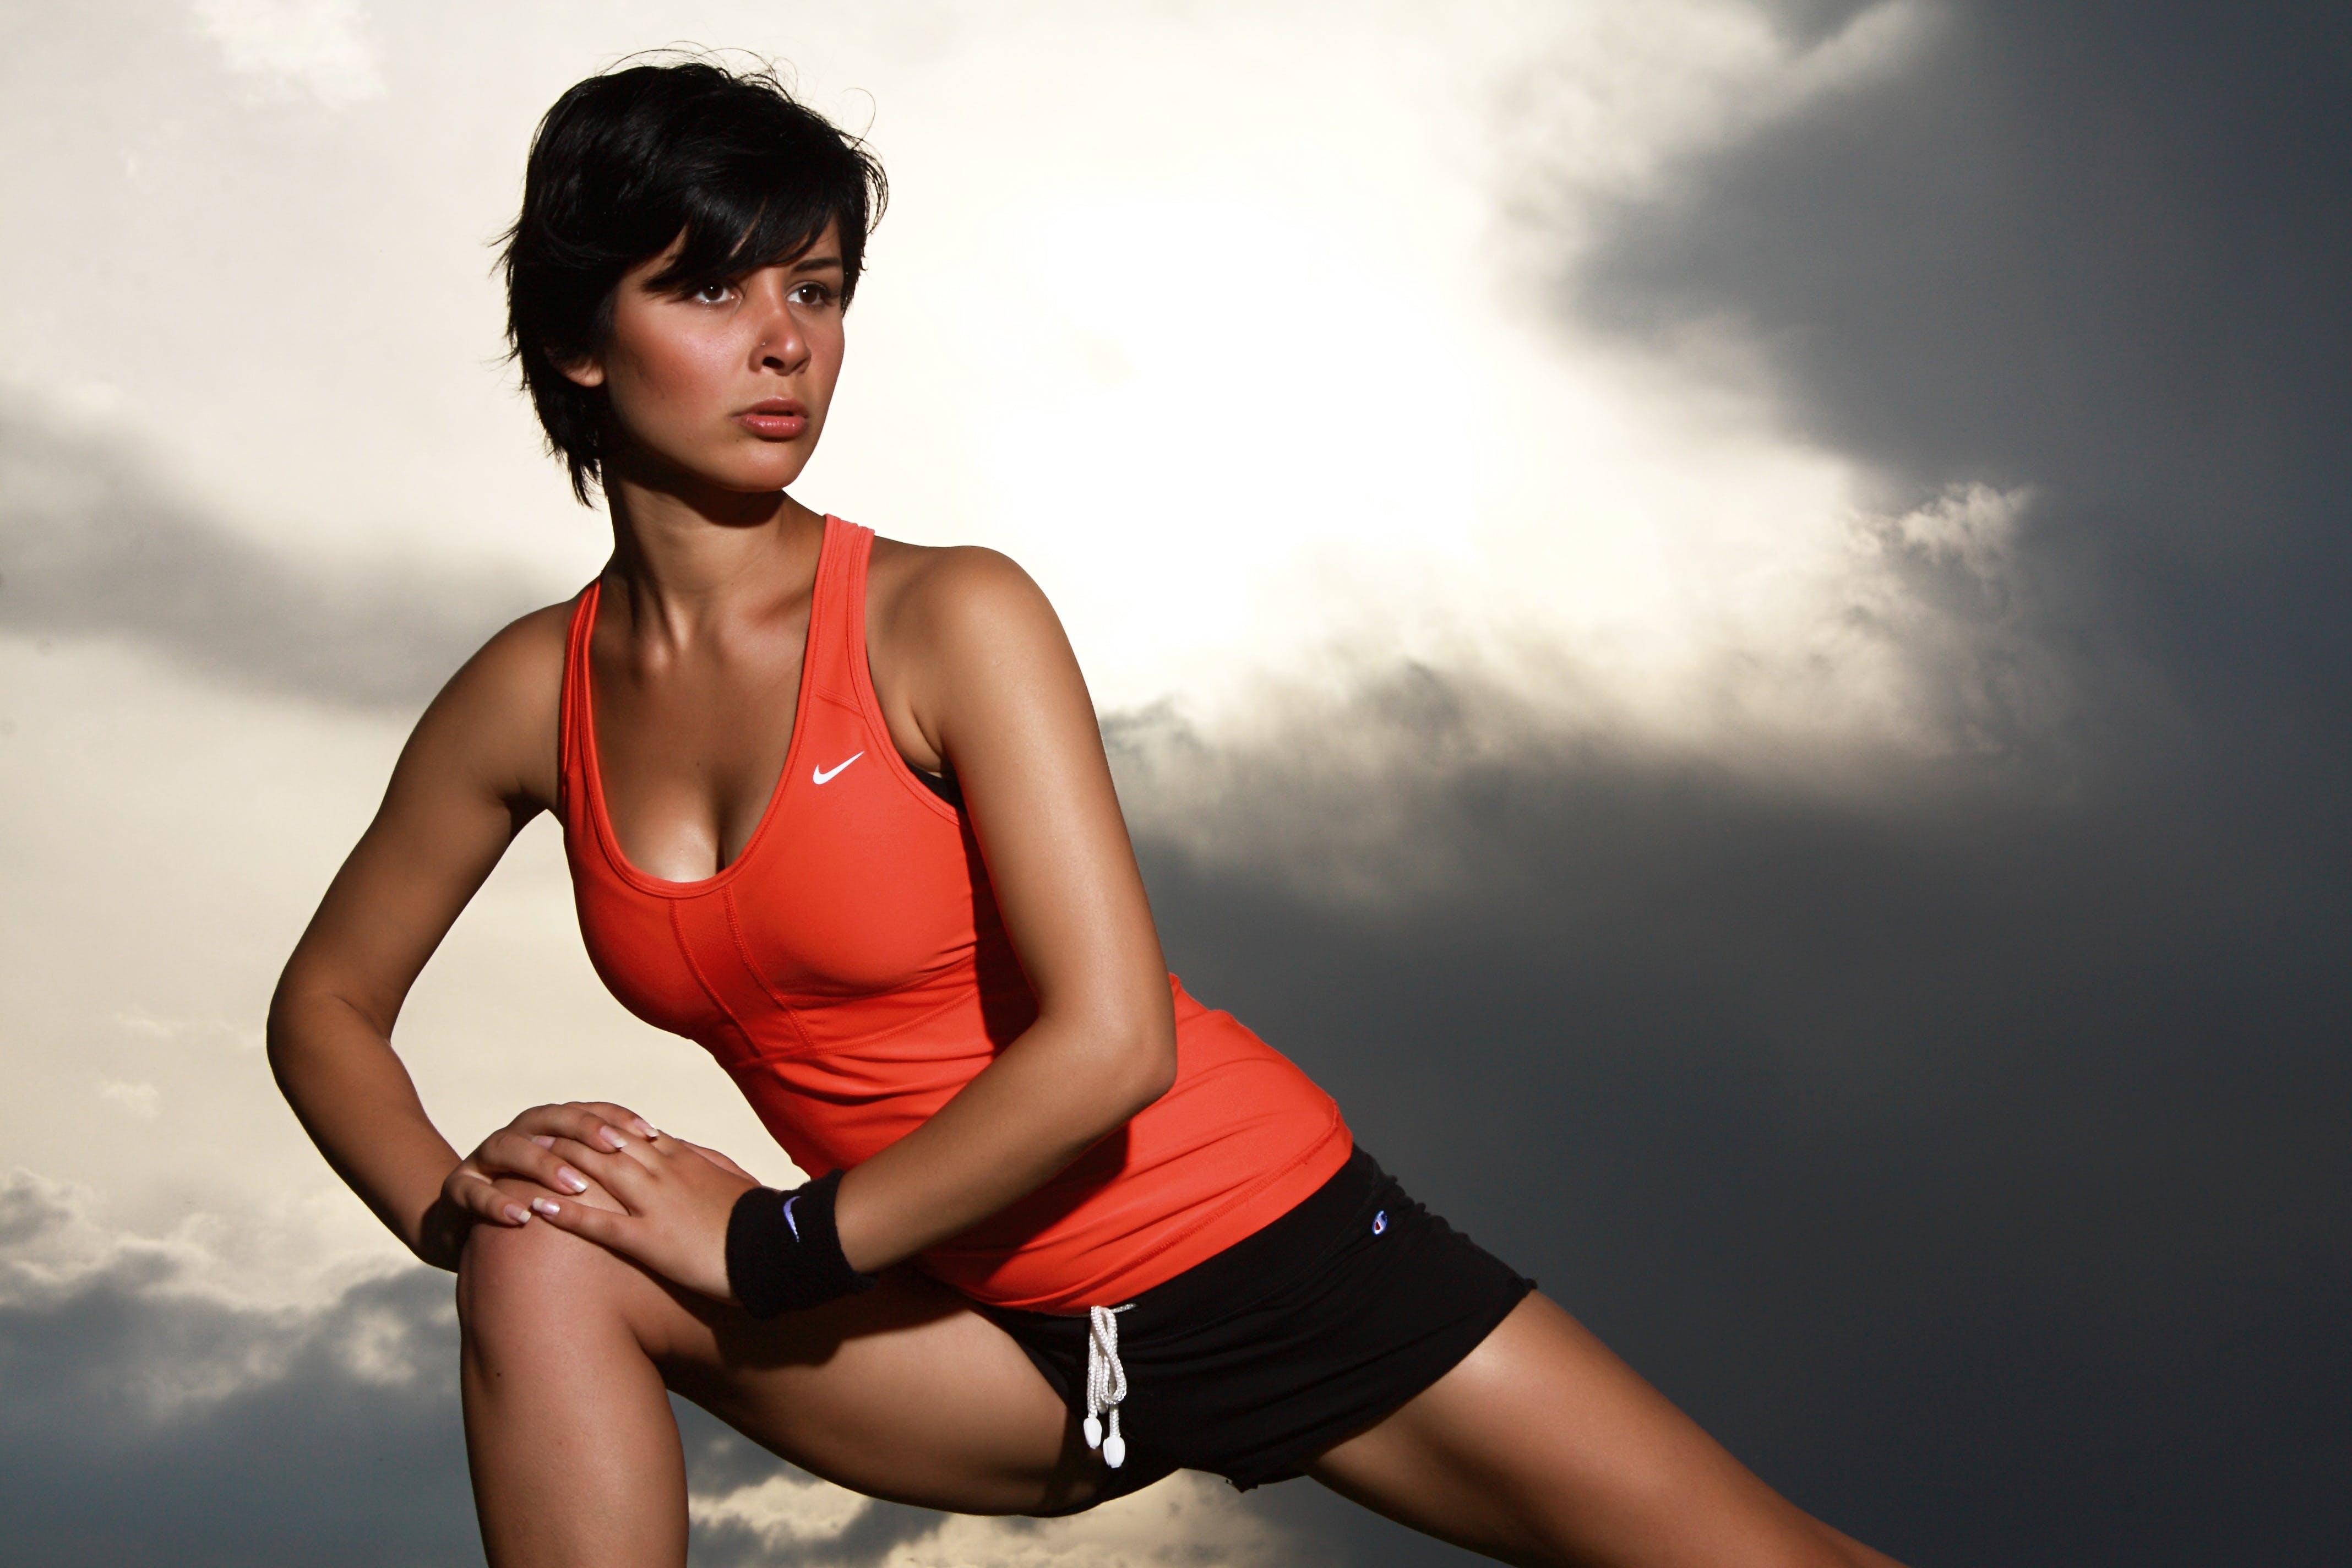 Woman Doing Leg Stretching